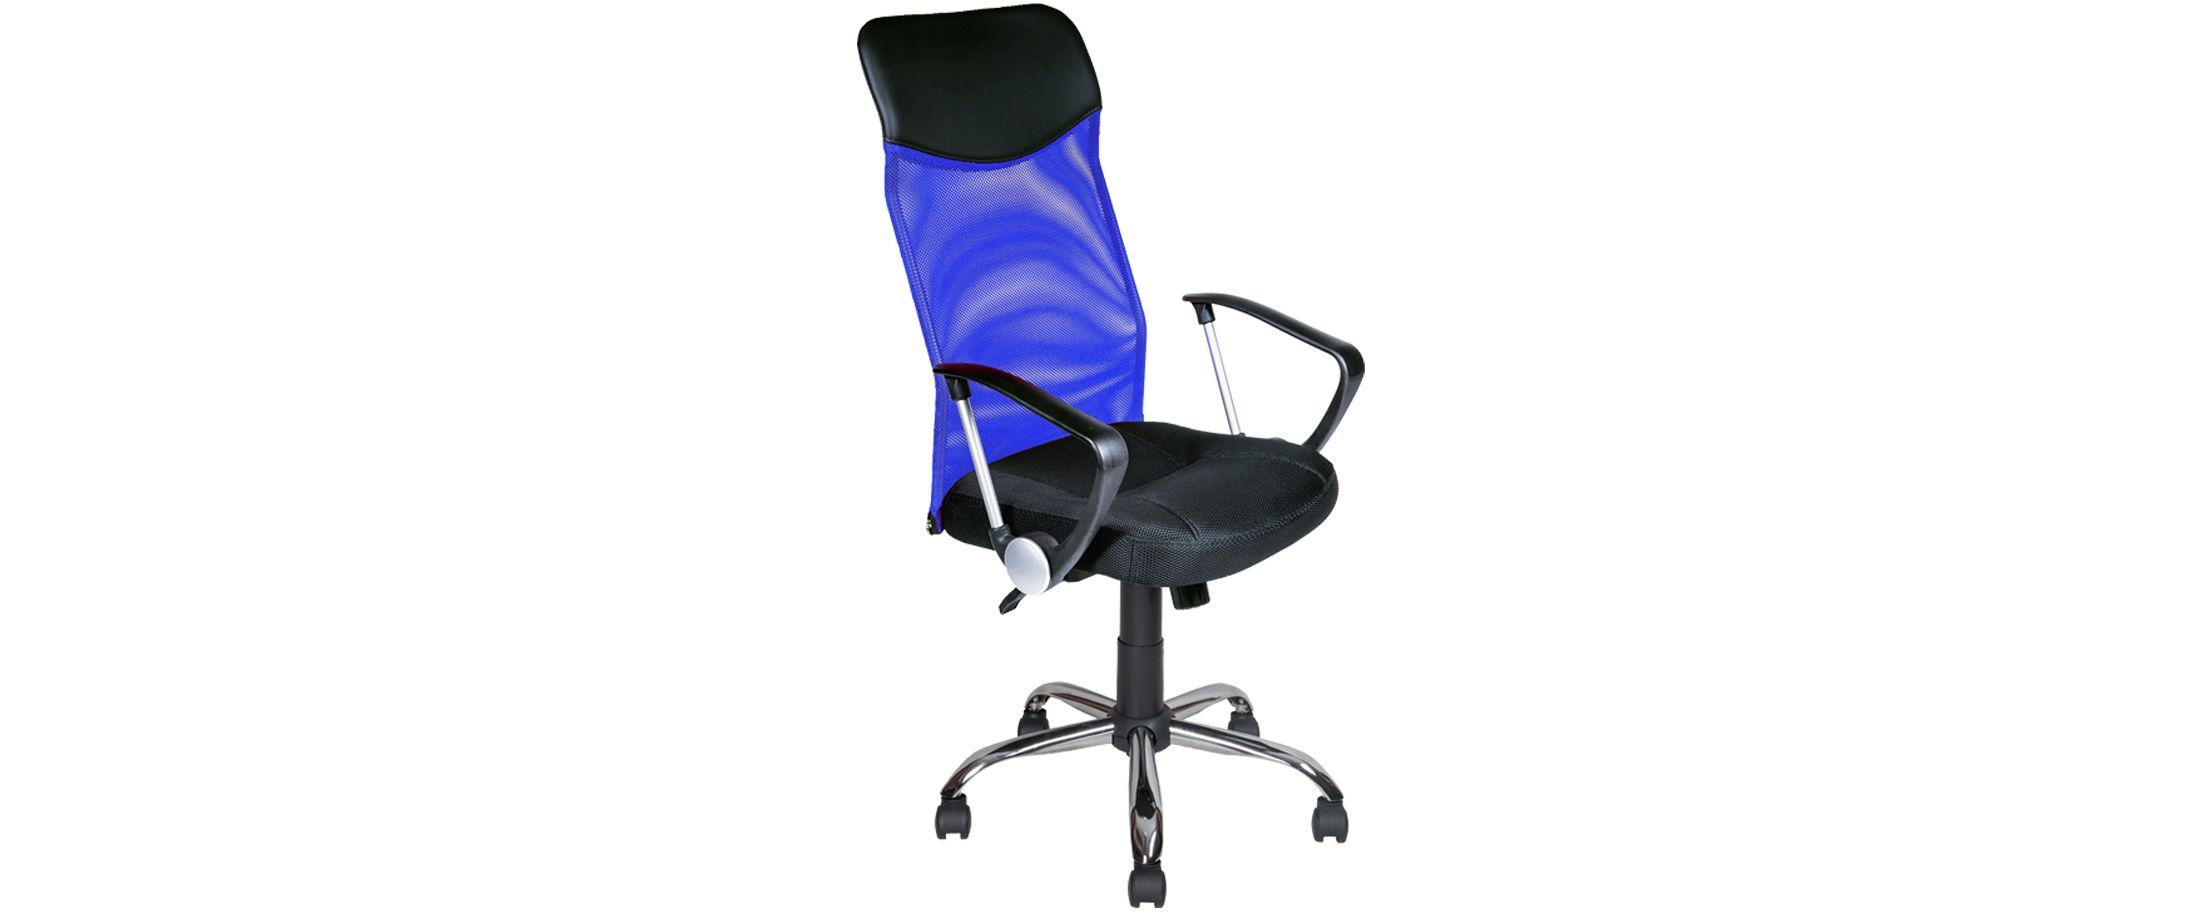 Кресло офисное AV 128 цвет синий Модель 999Кресло офисное AV 128 цвет синий Модель 999. Артикул Д000714<br>